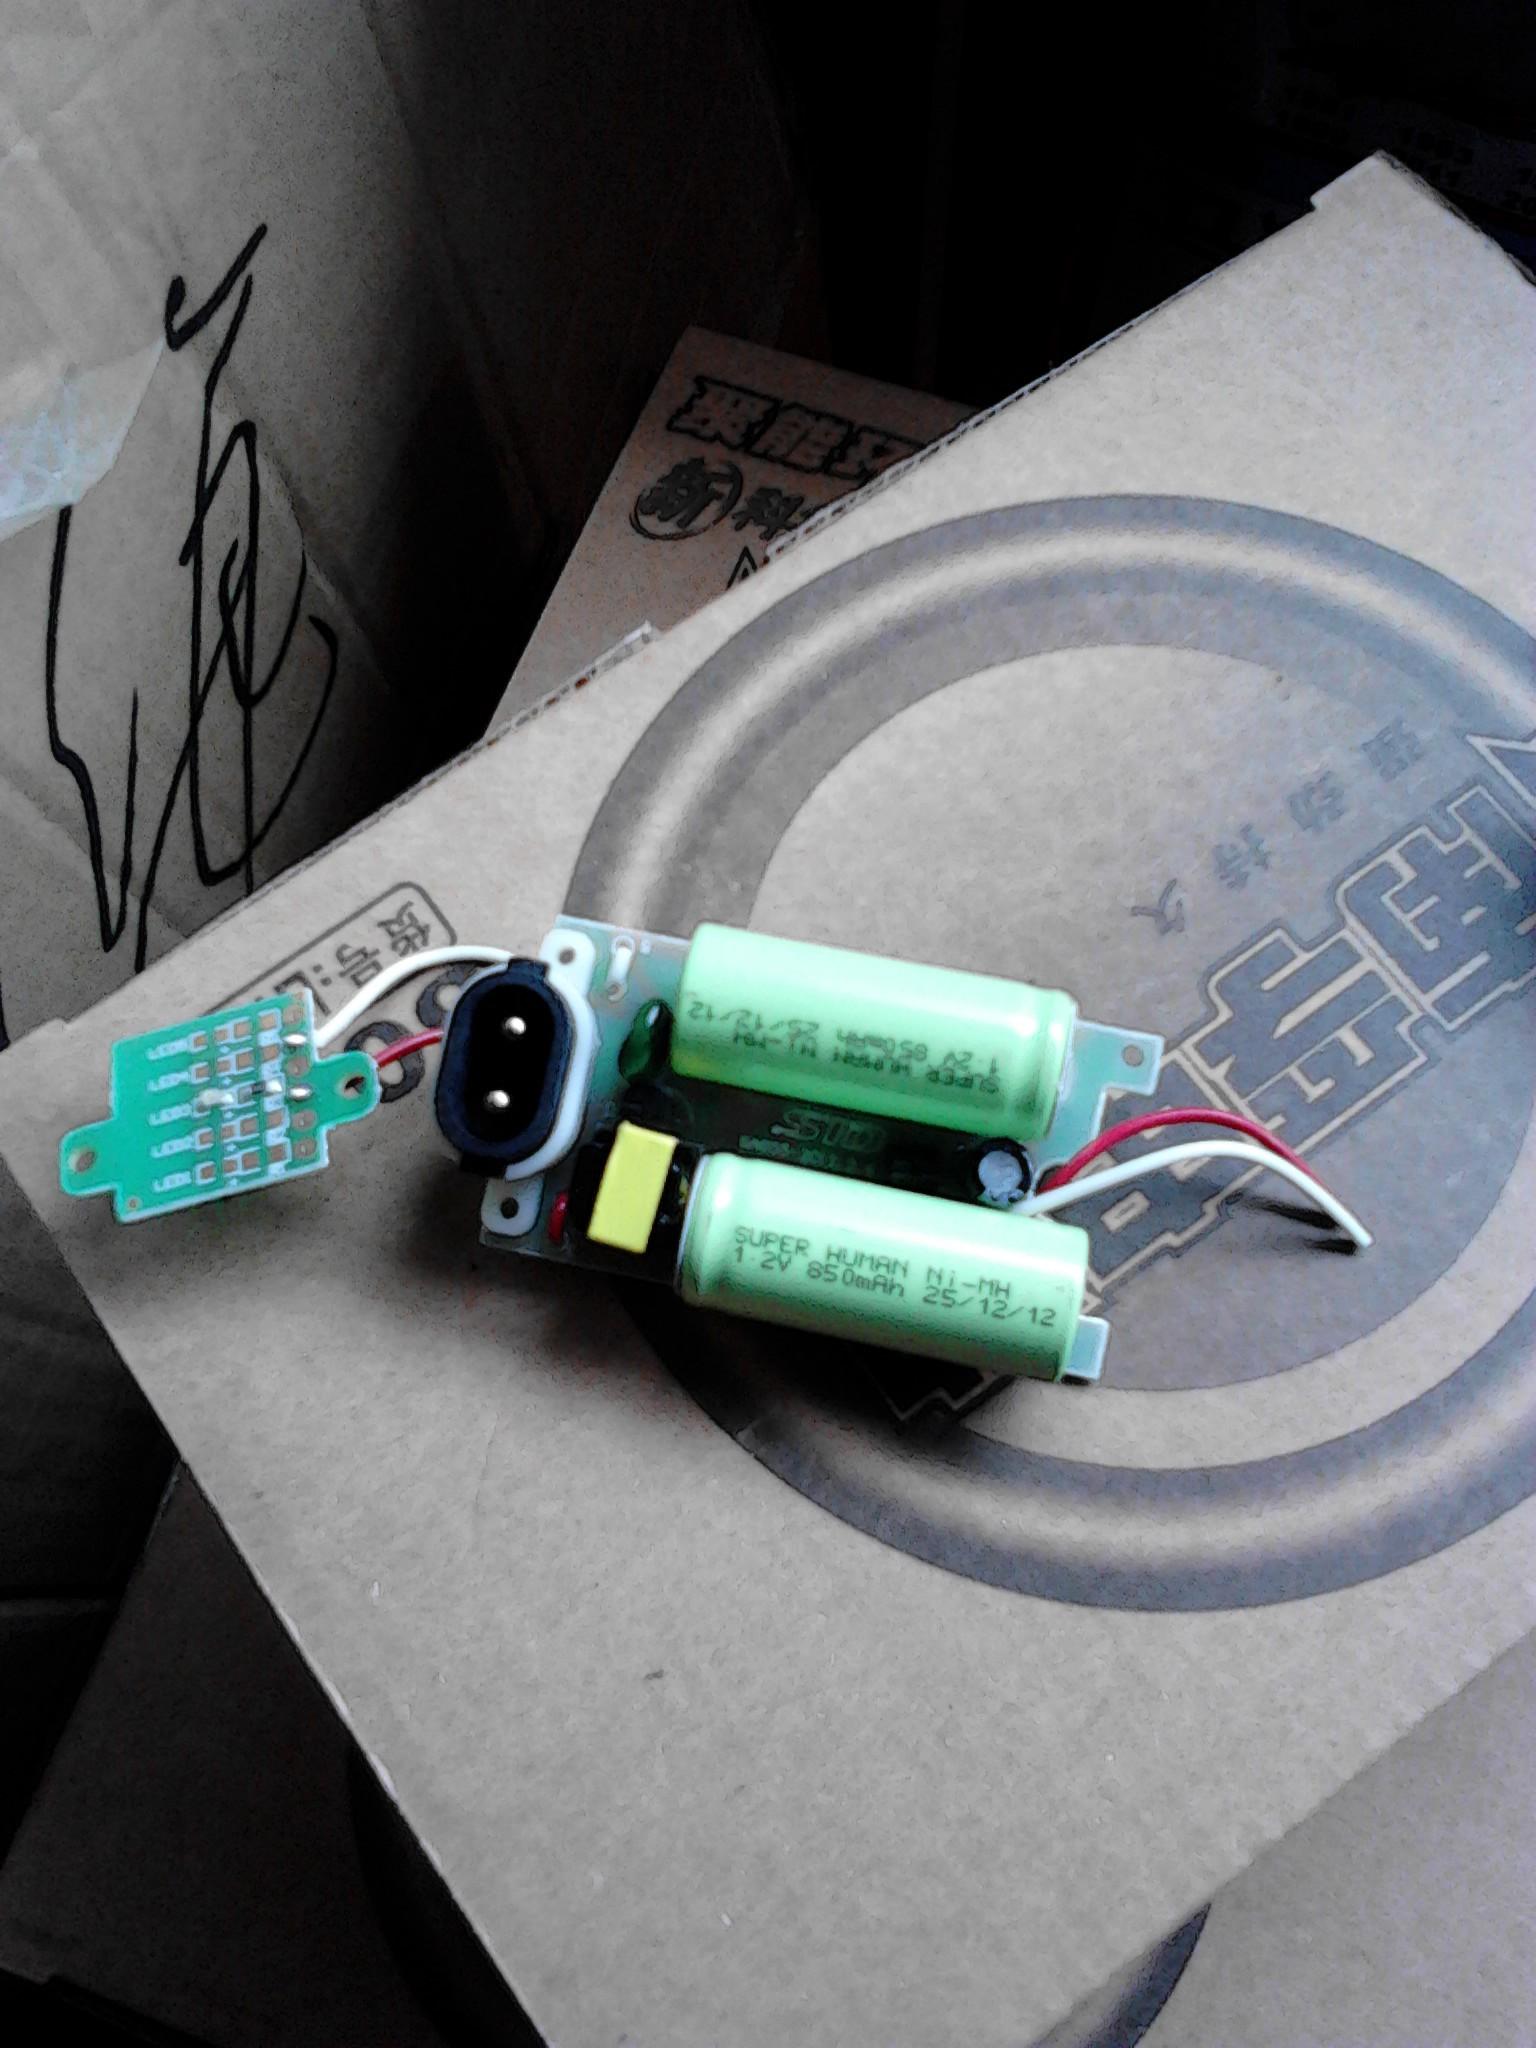 Аксессуары для электробритвы SID SA855 SA7132 200pcs lot ams1117 2 5 ams1117 2 5v 2 5v 1a voltage regulator ldo sot 223